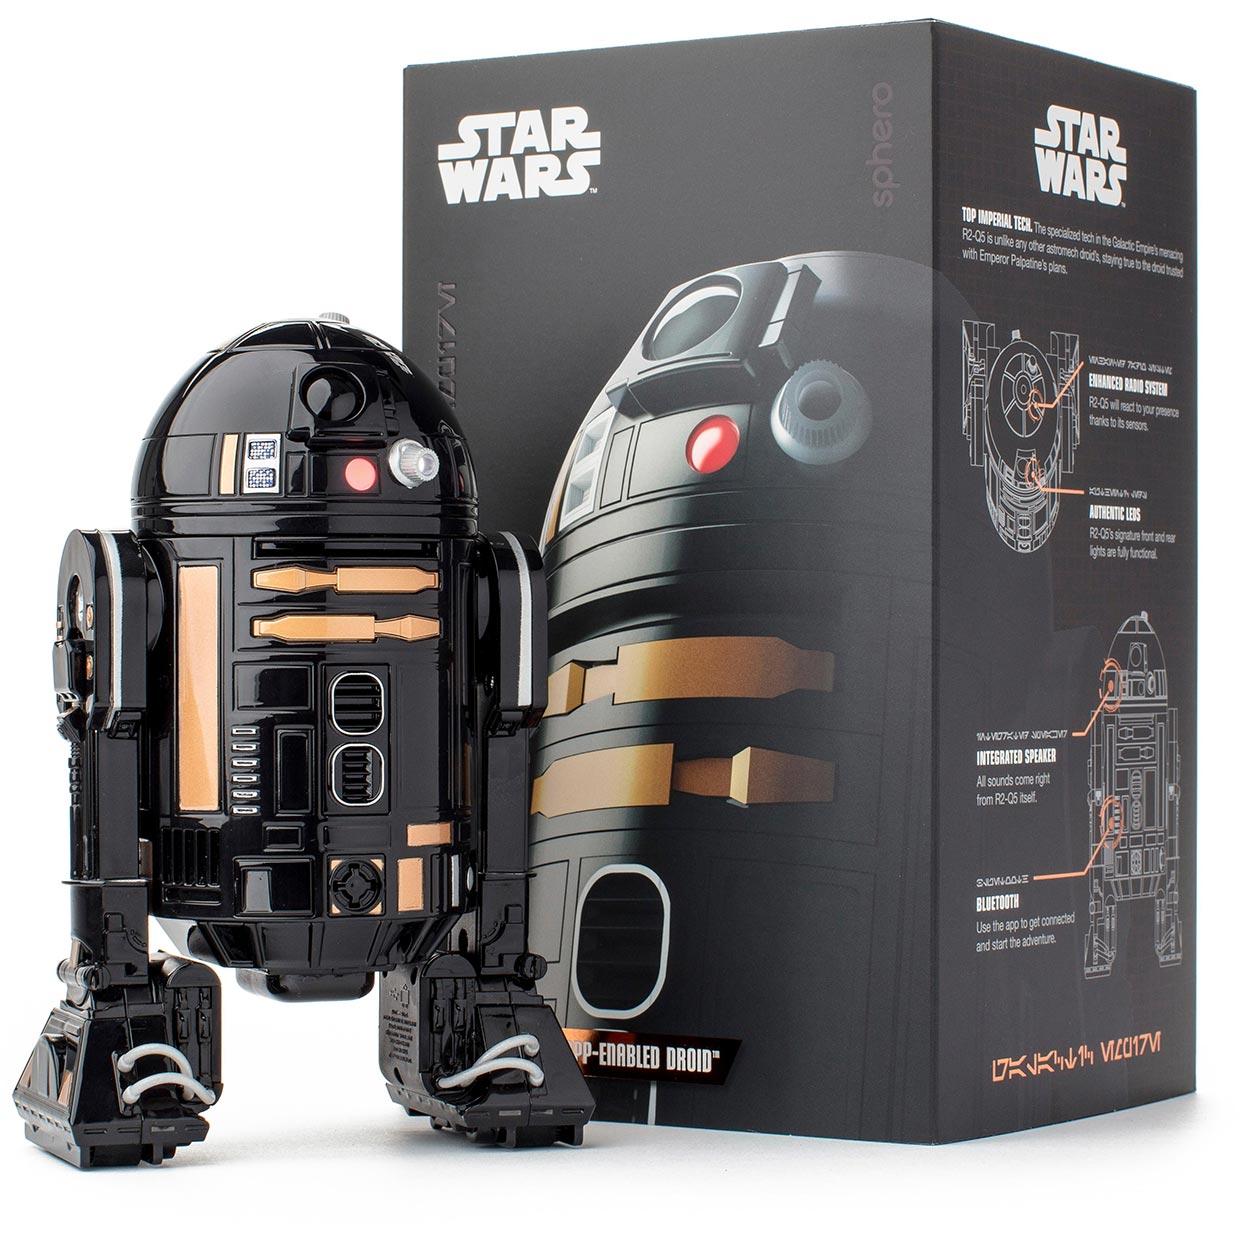 Star Wars Droids App by Sphero on the App Store